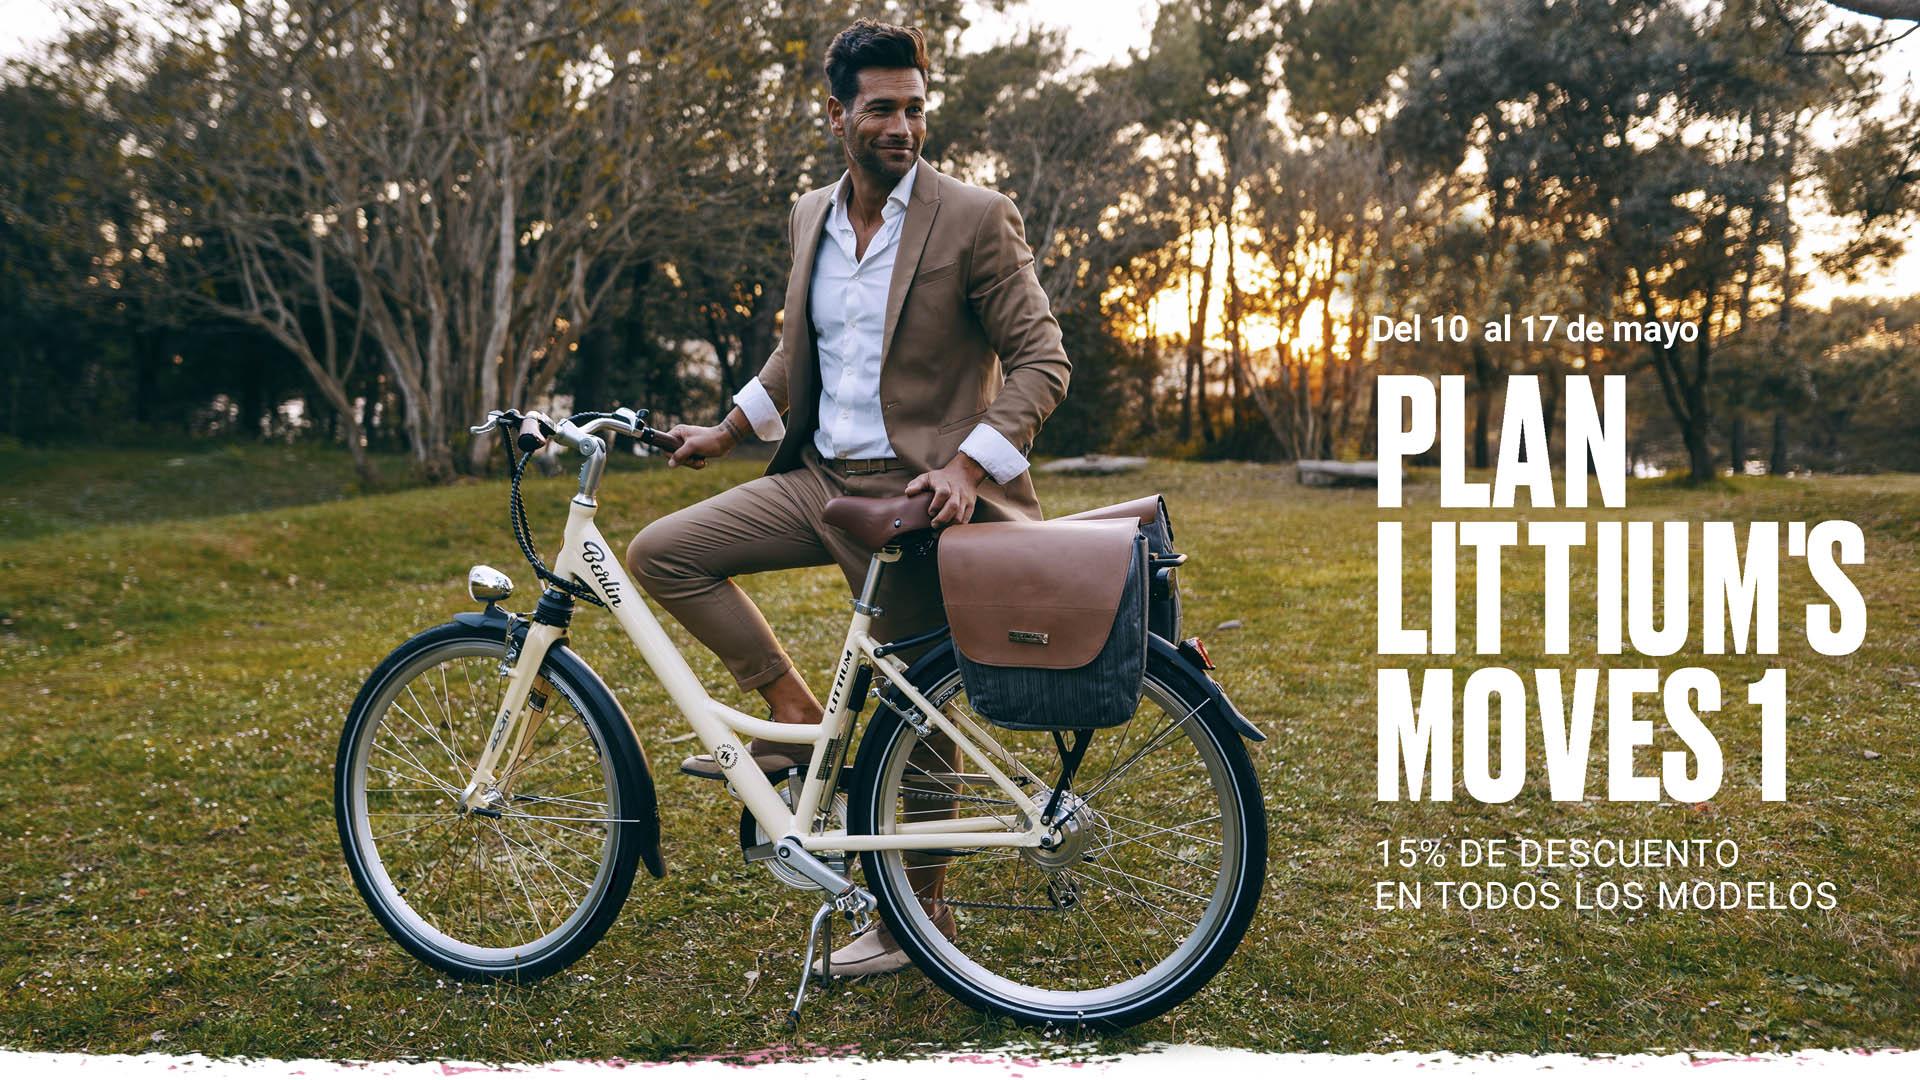 LITTIUM, EL FUTURO DE LA MOVILIDAD ELÉCTRICA SE INCORPORA A LAFUGA CYCLING